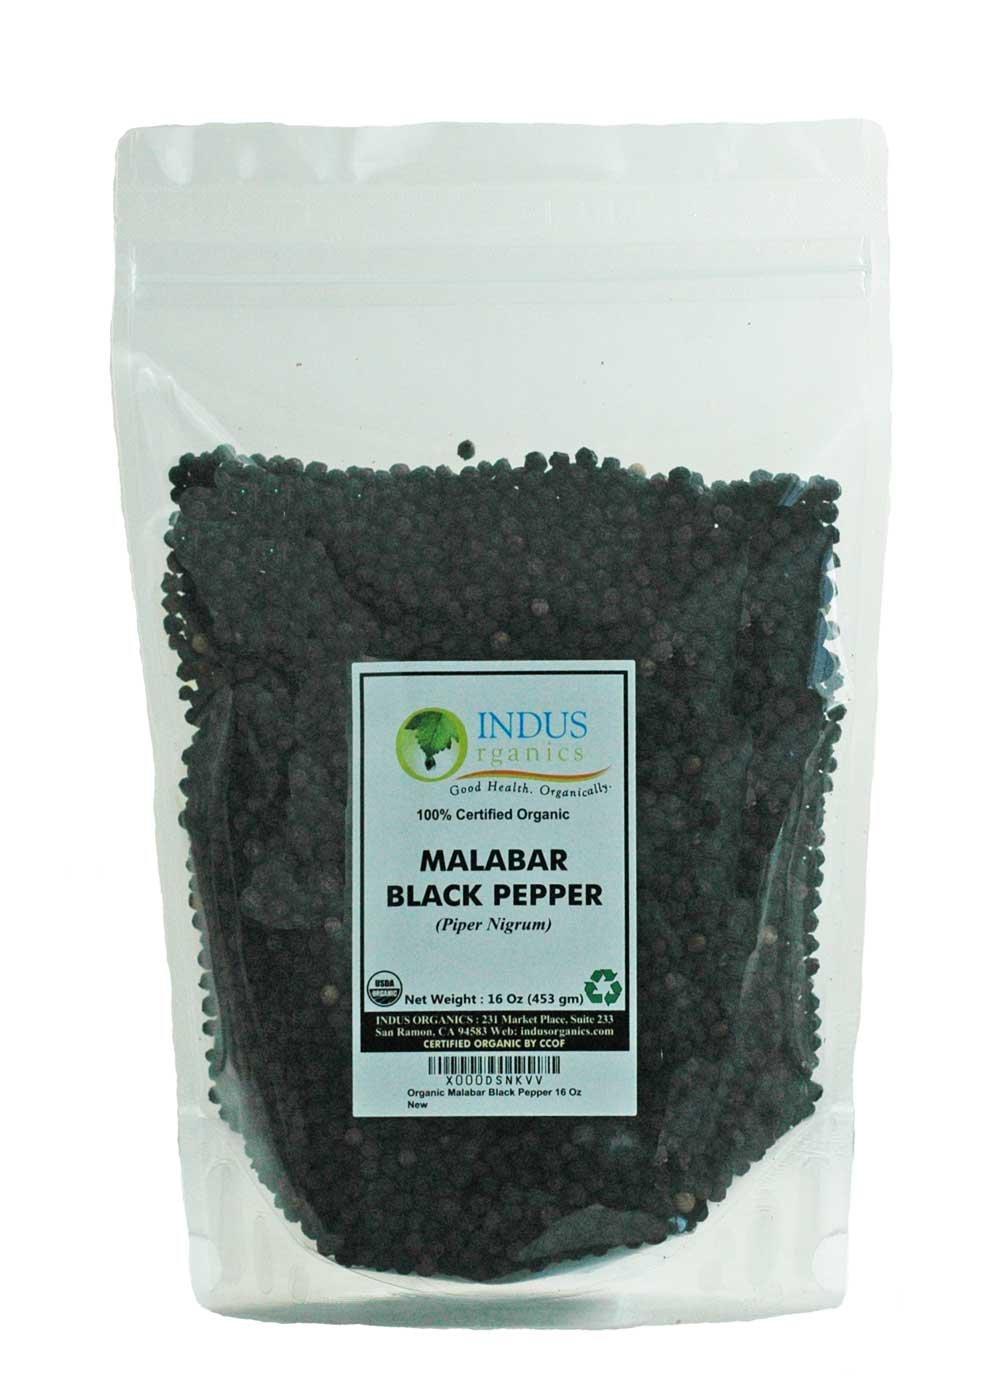 Amazon.com : Indus Organics Tellicherry Black Peppercorns, 1 Lb Jar ...